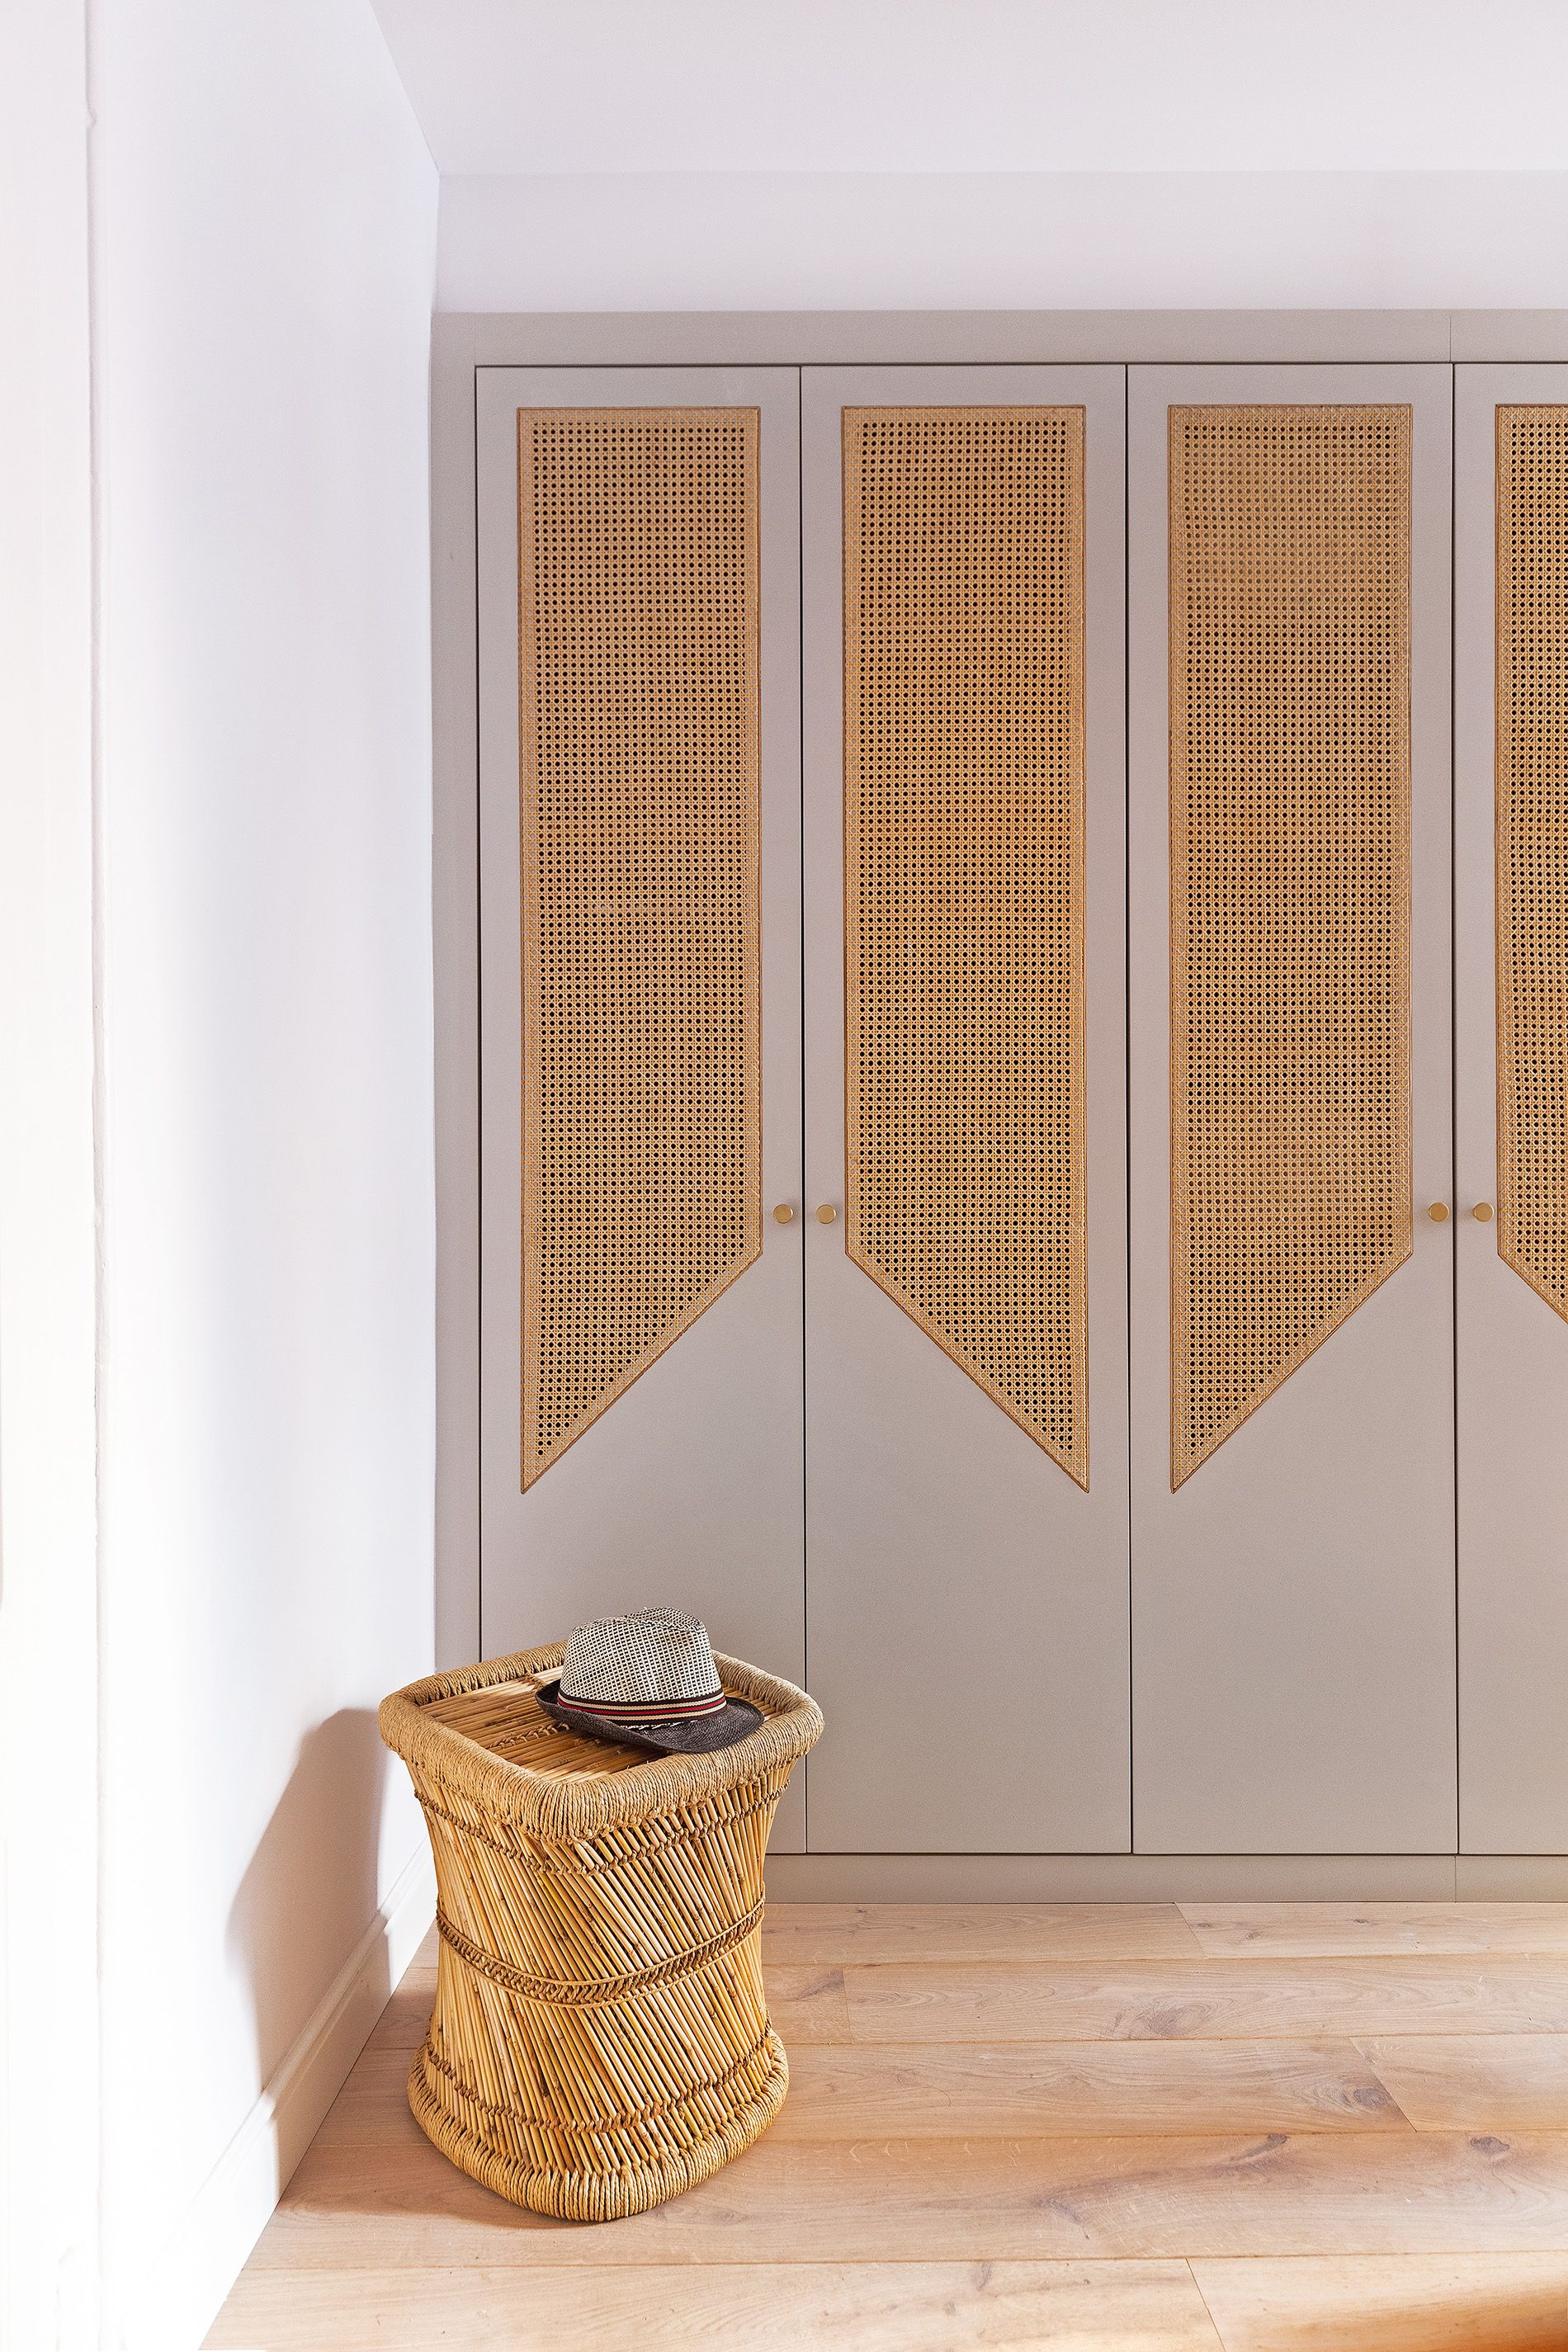 grey cupboard, rattan accent, wooden floor, rattan ottoman, white wall